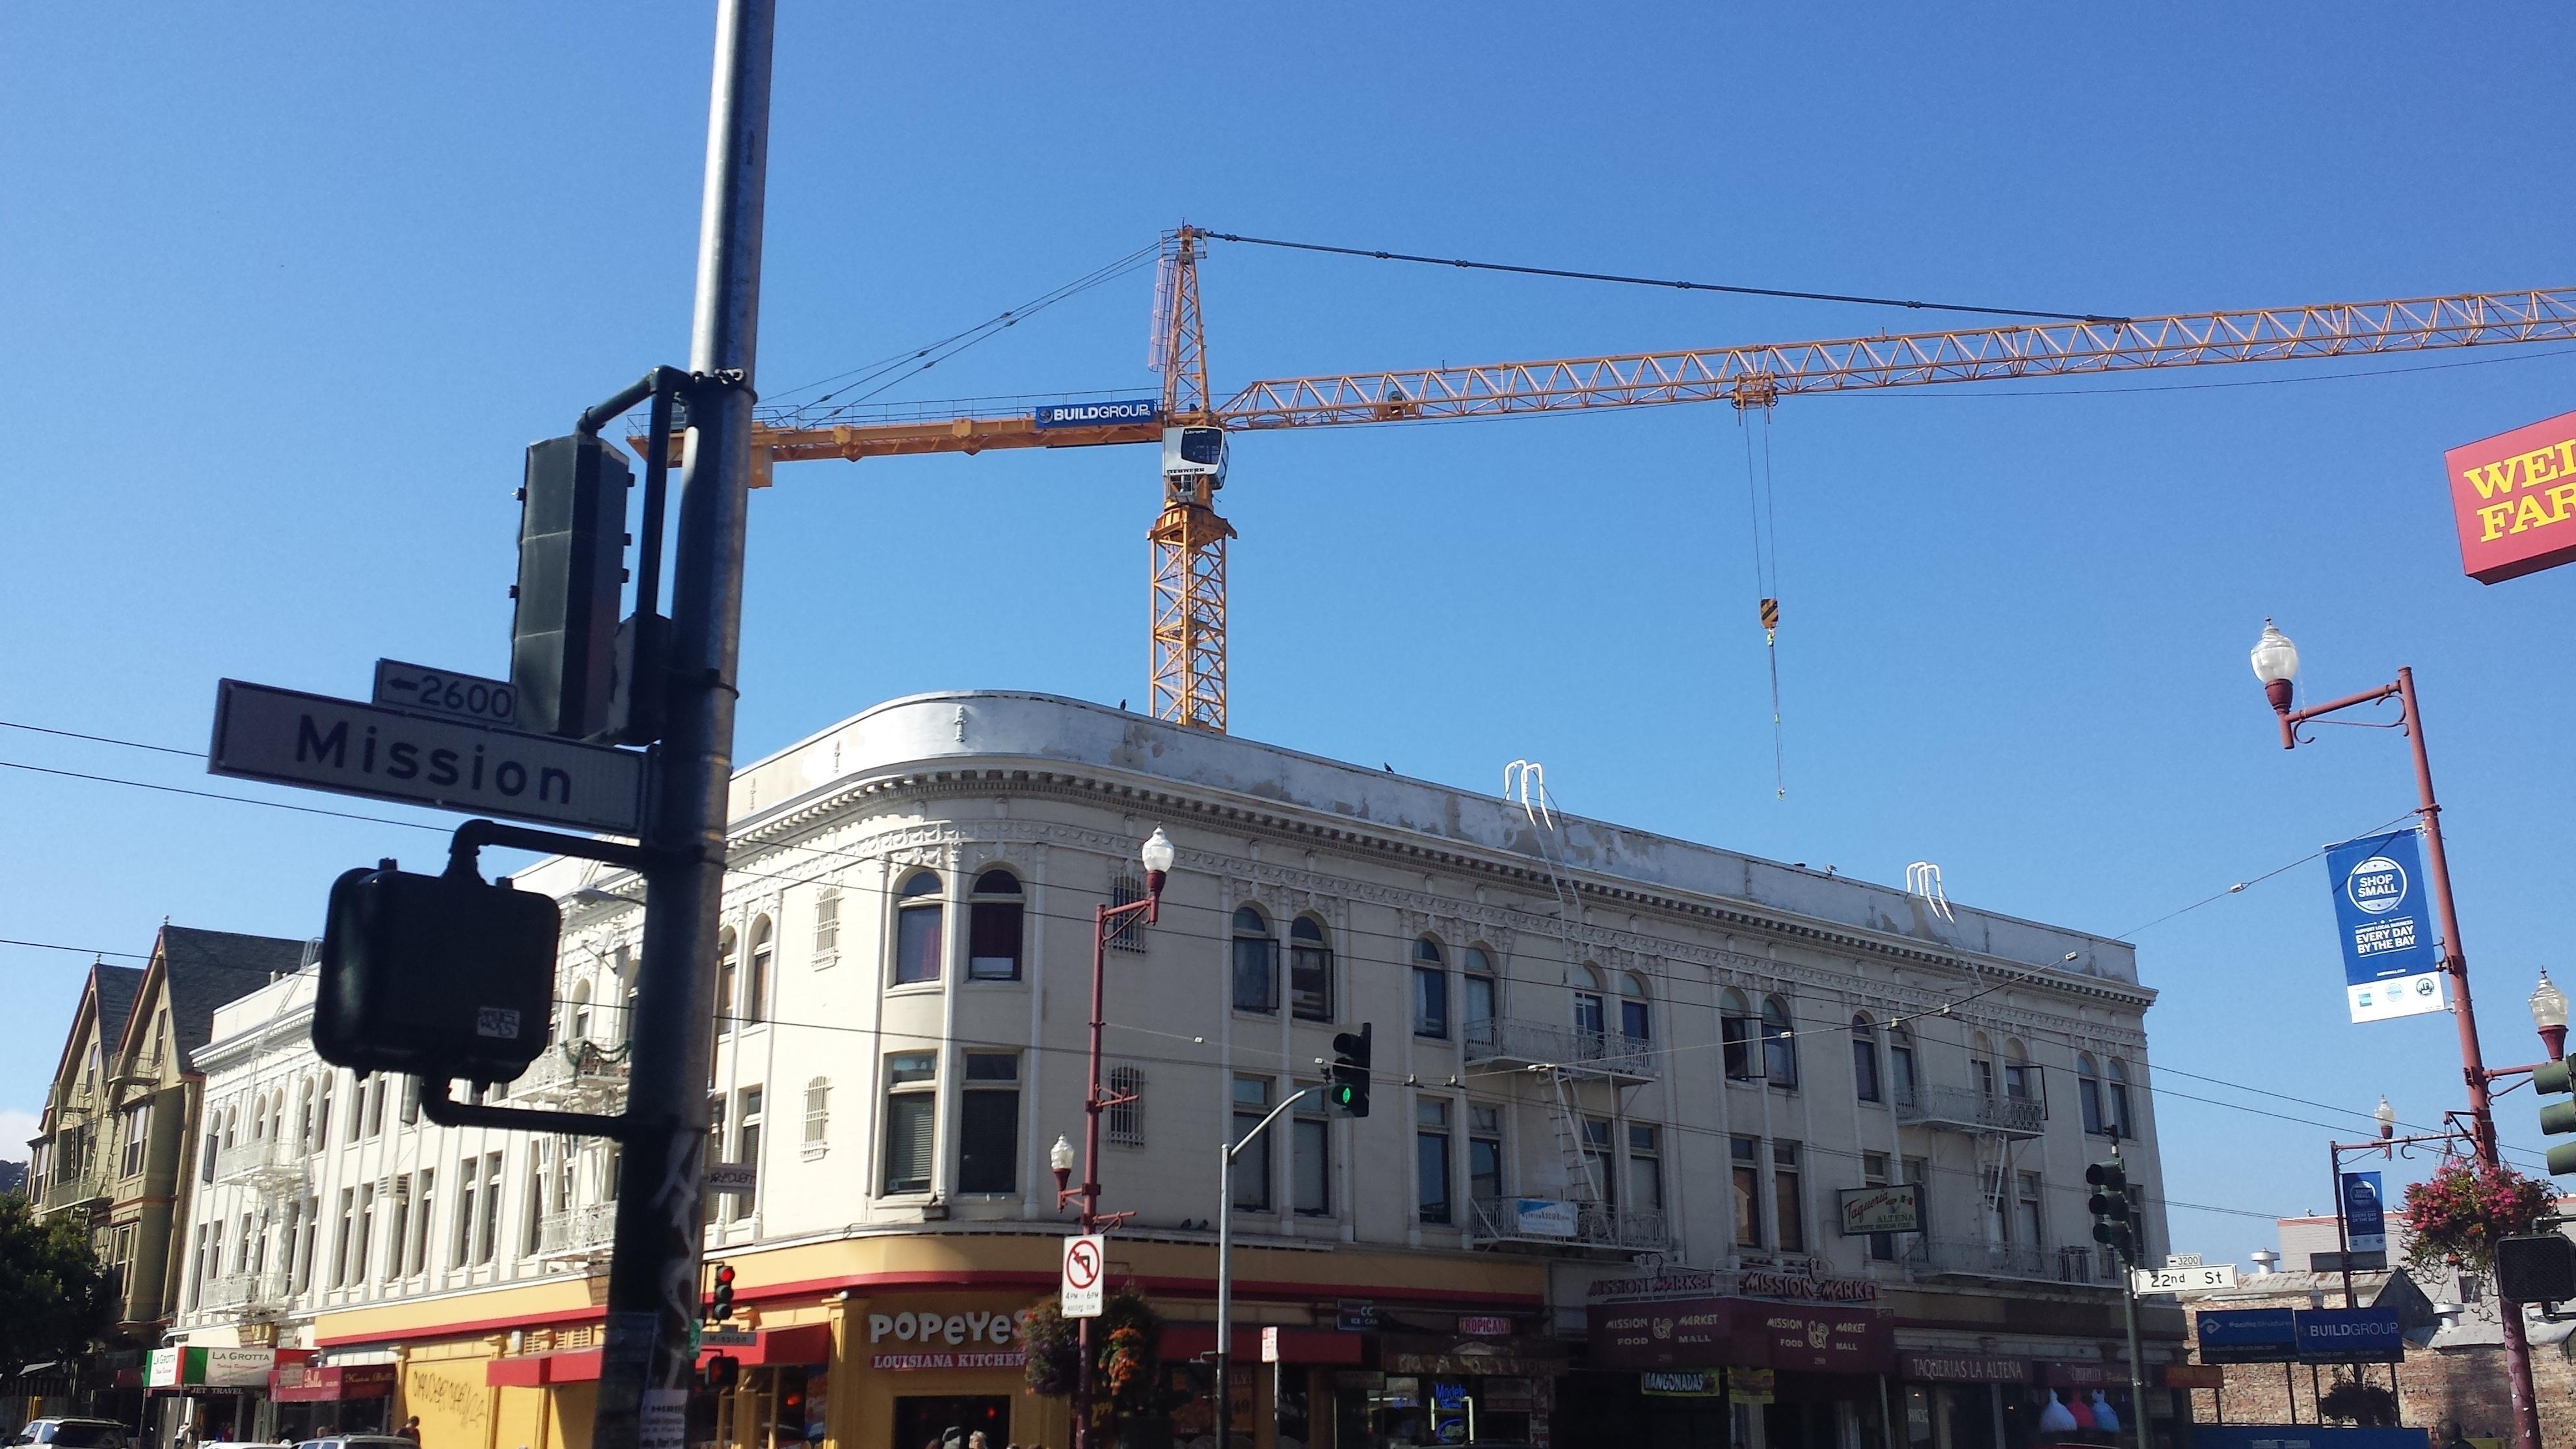 SNAP: Crane